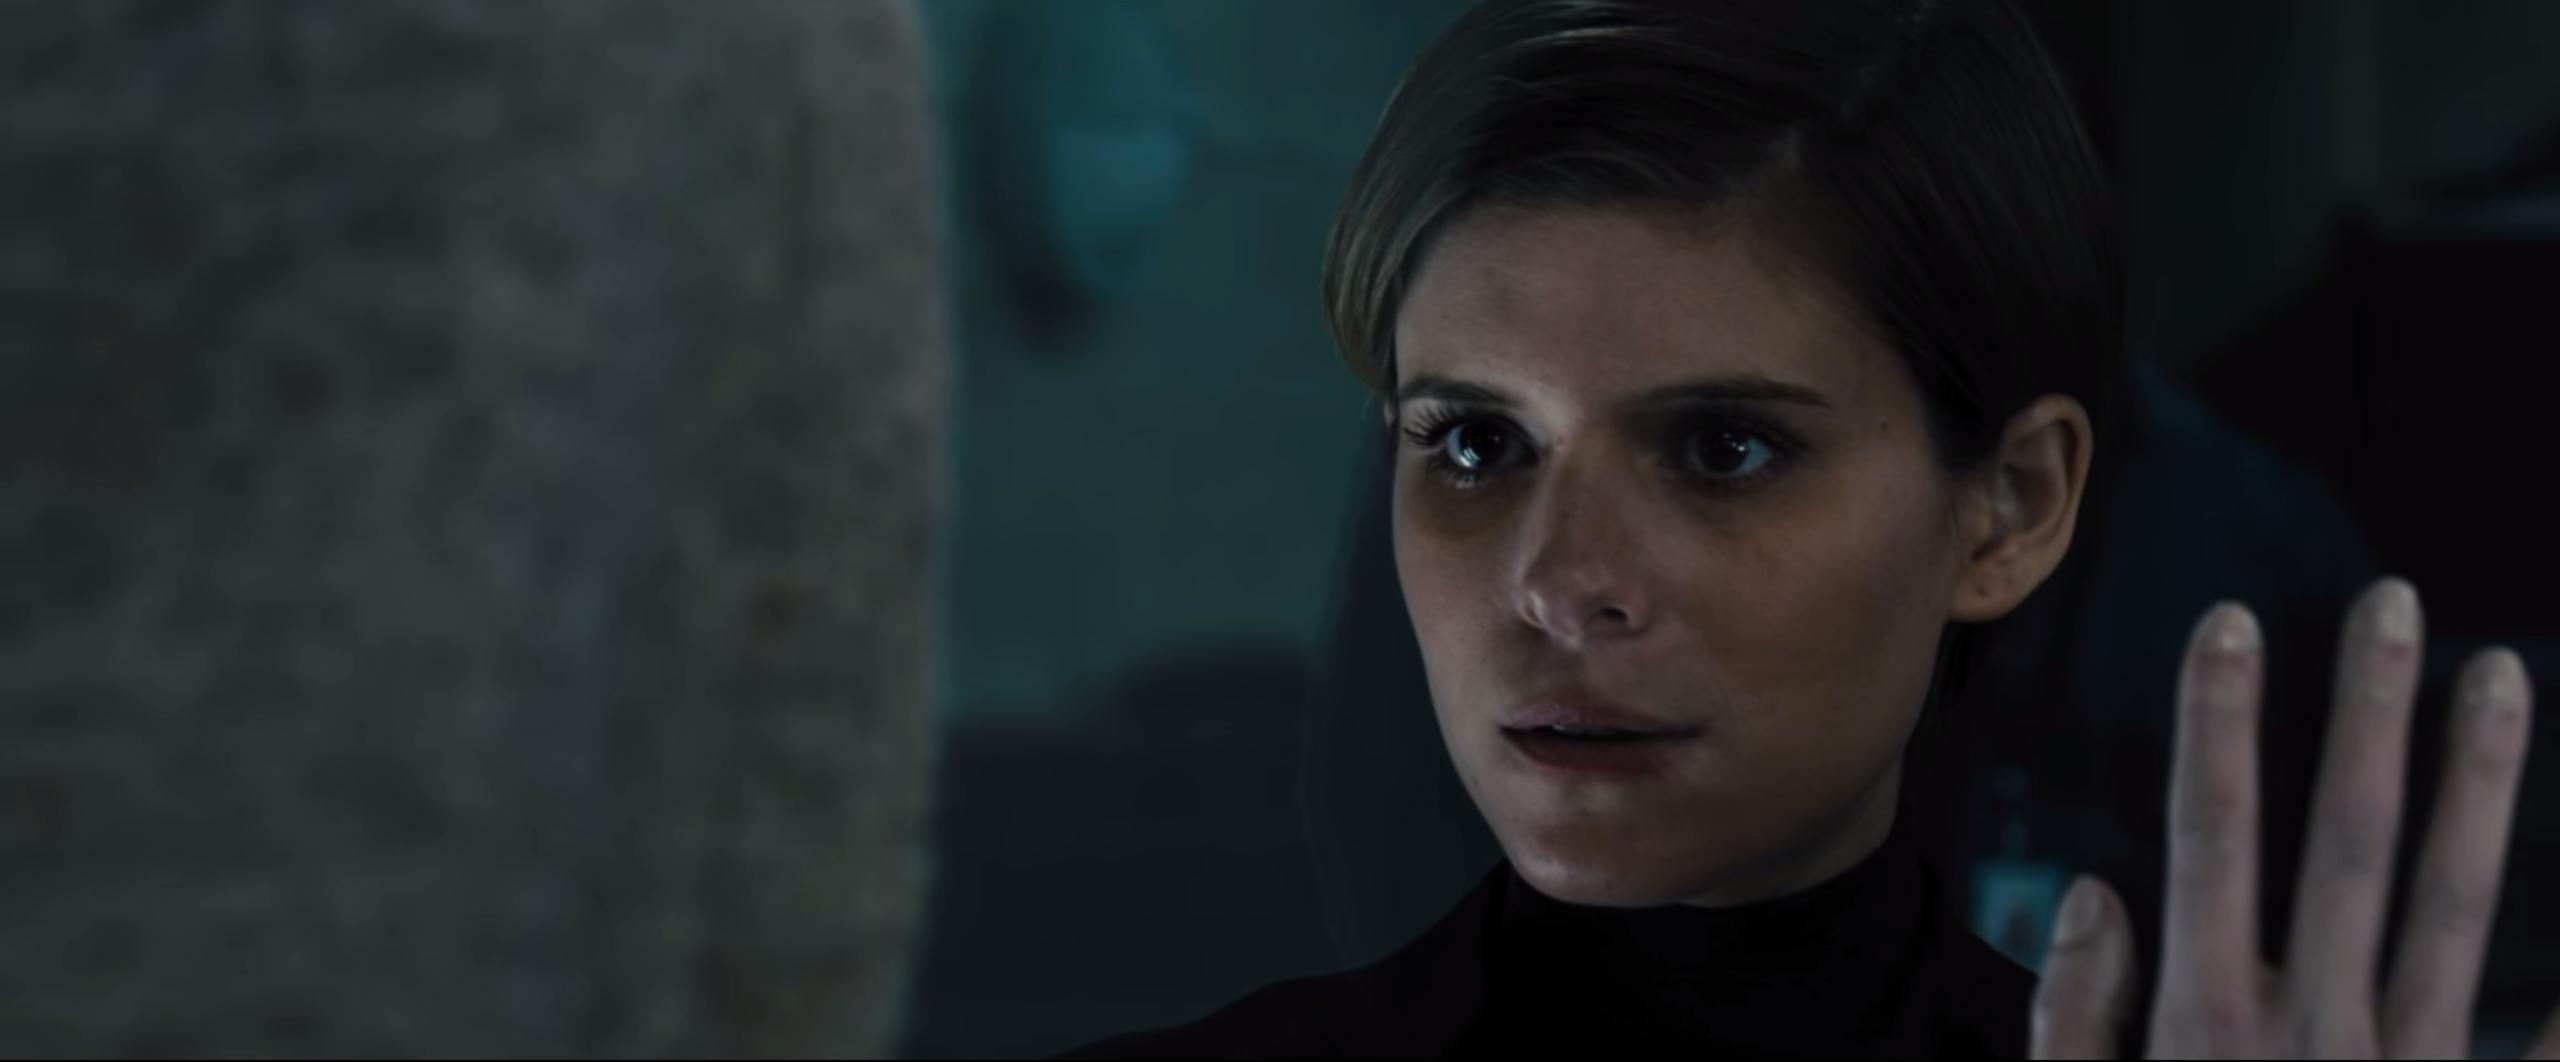 Morgan Film: Morgan Trailer Pits Kate Mara Against Evil Artificial Life